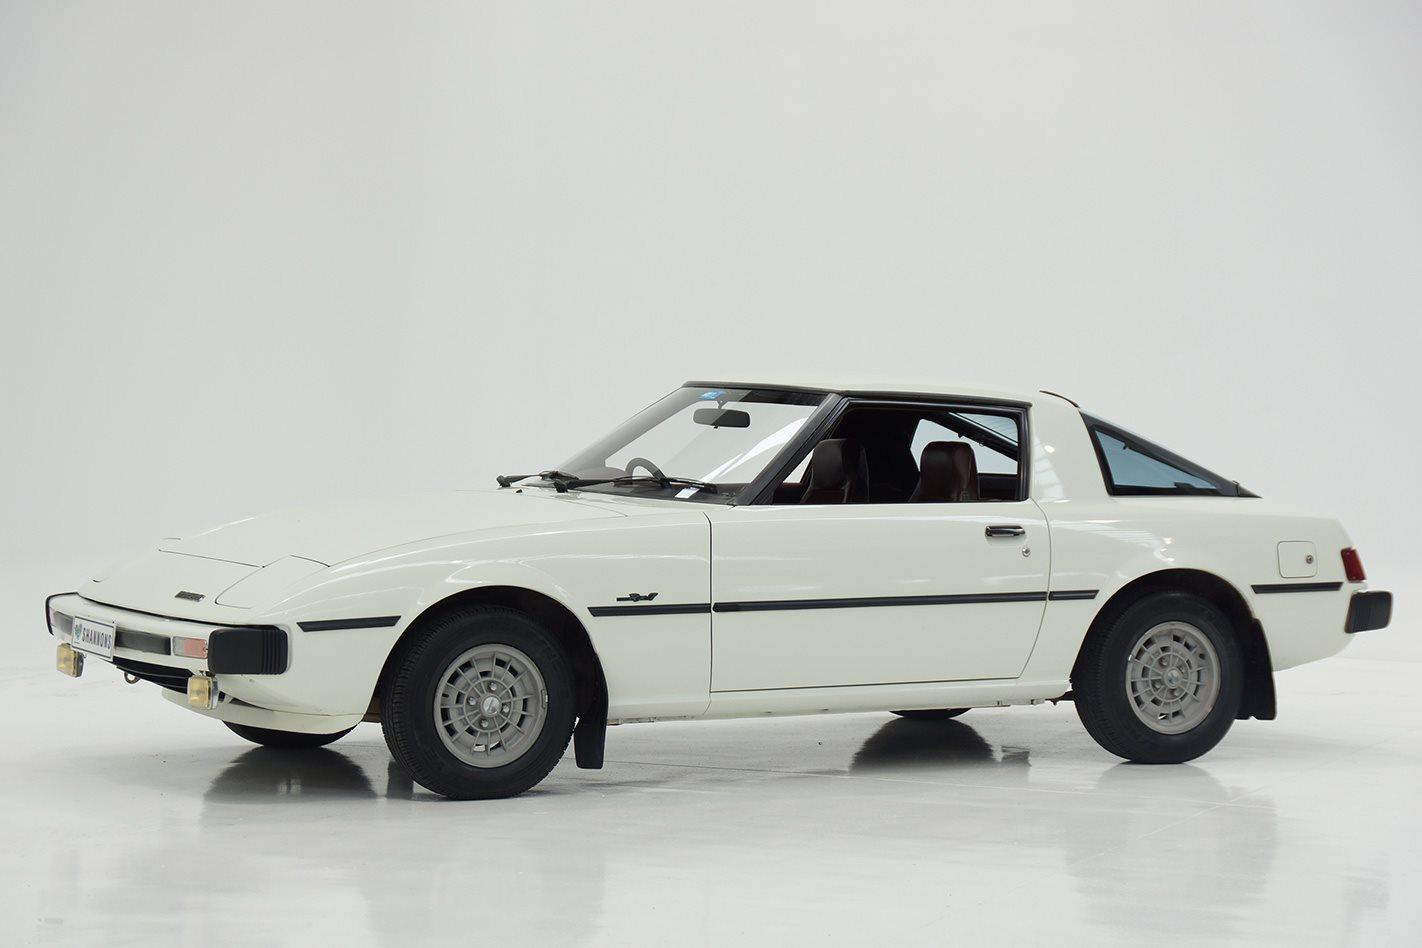 1979 Mazda RX7 Series 1 Coupe rear